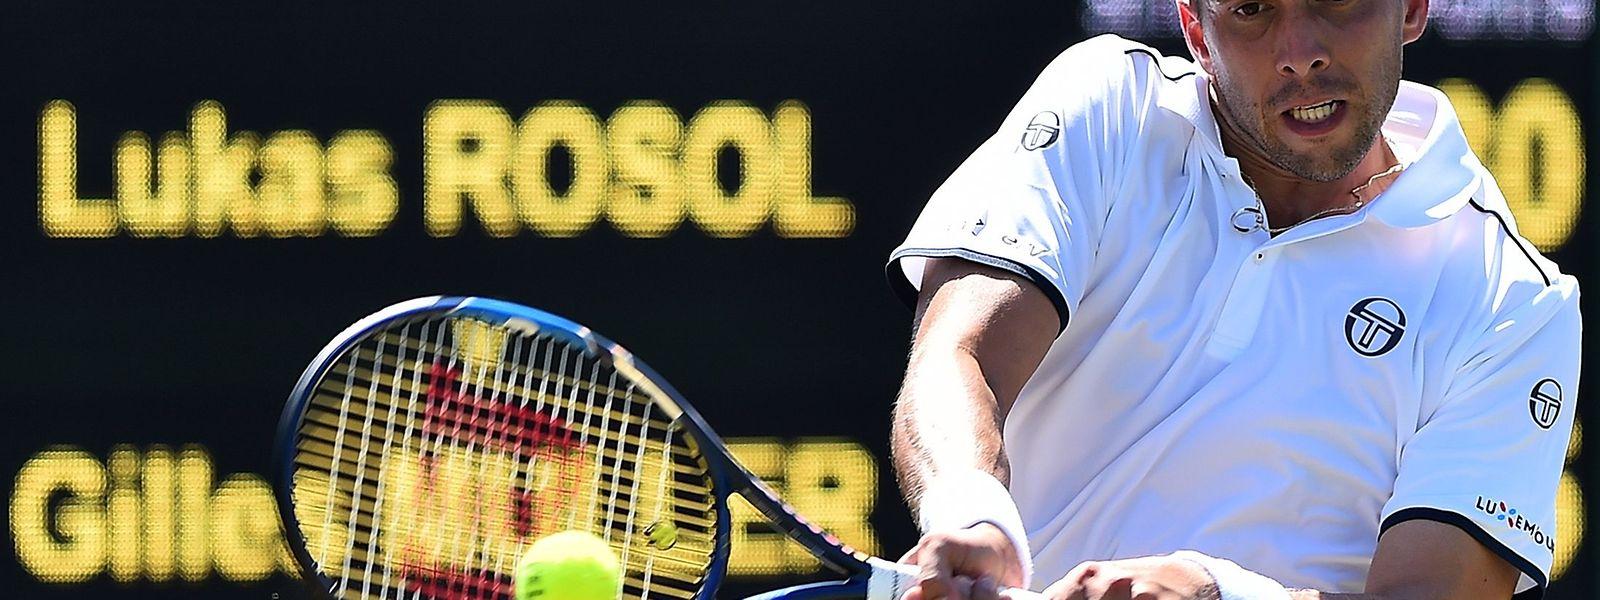 Gilles Muller spielt erstmals in Wimbledon gegen einen Briten.